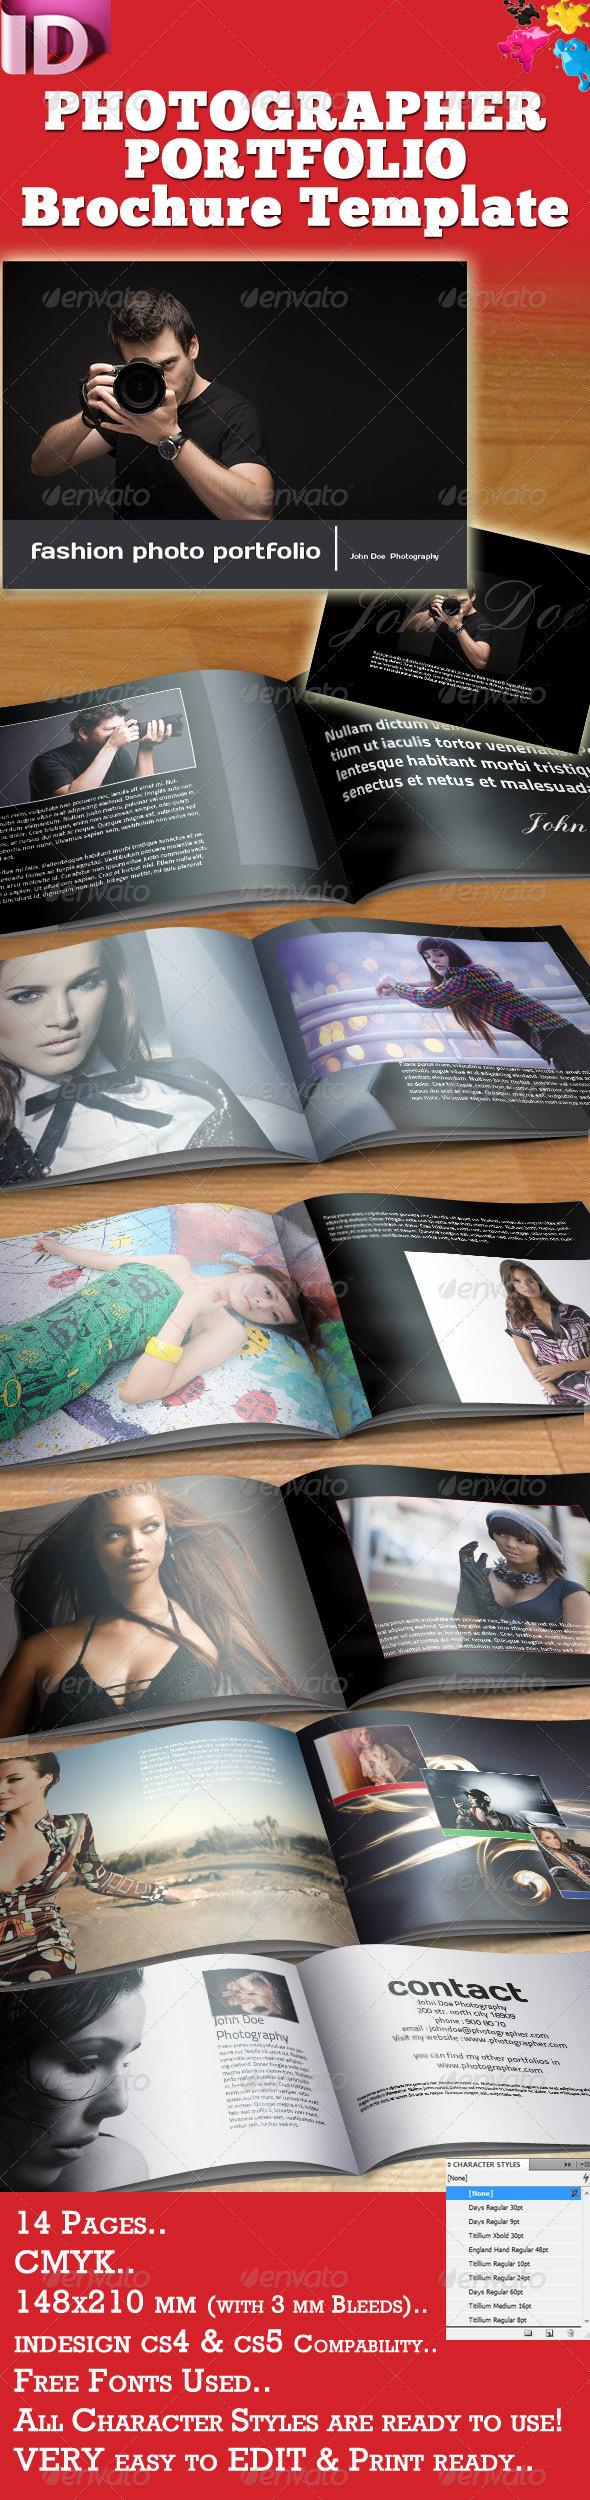 GraphicRiver Photographer Portfolio Brochure Template 947678